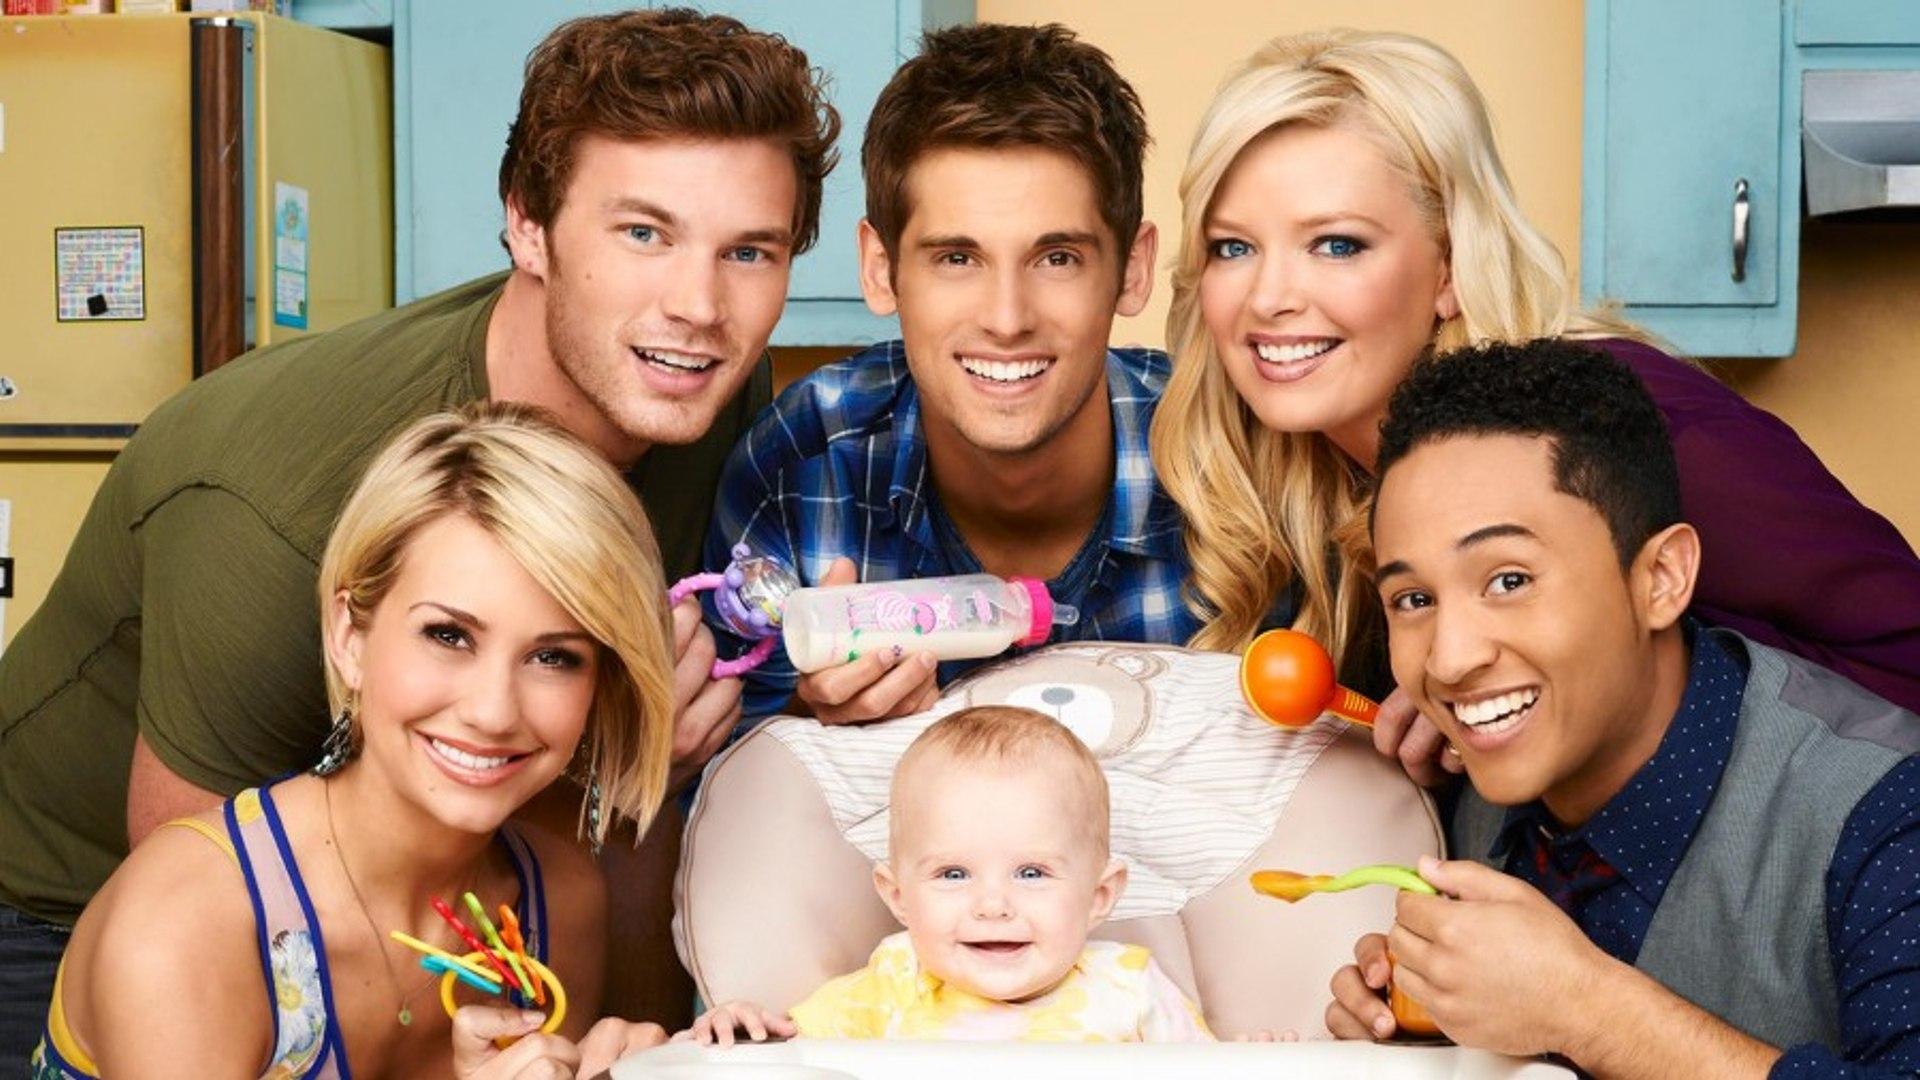 baby daddy season 1 episode 4 free online